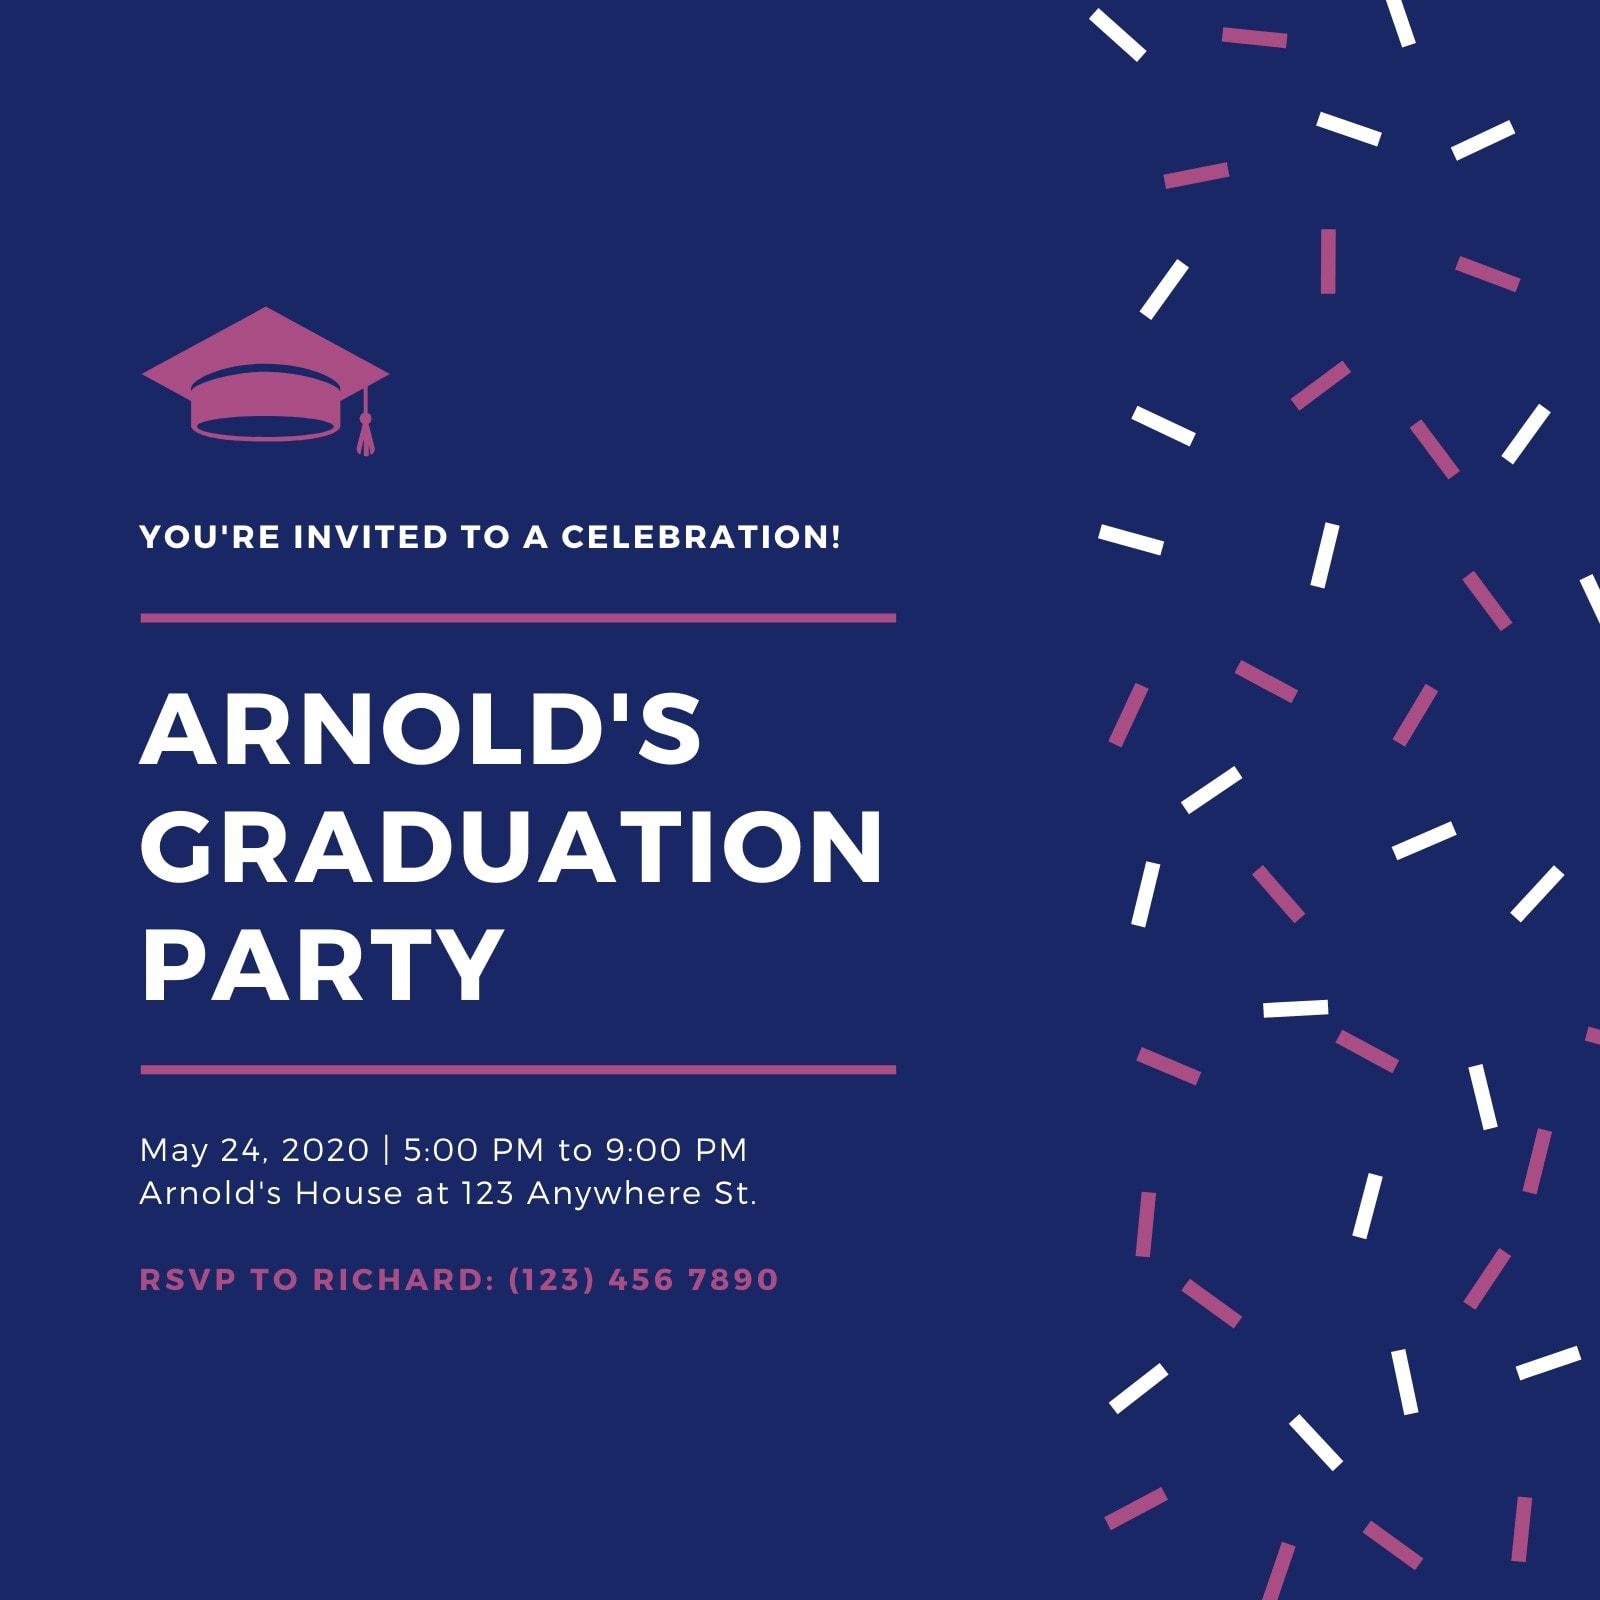 Graduation invitation template Instant download Canva photo template